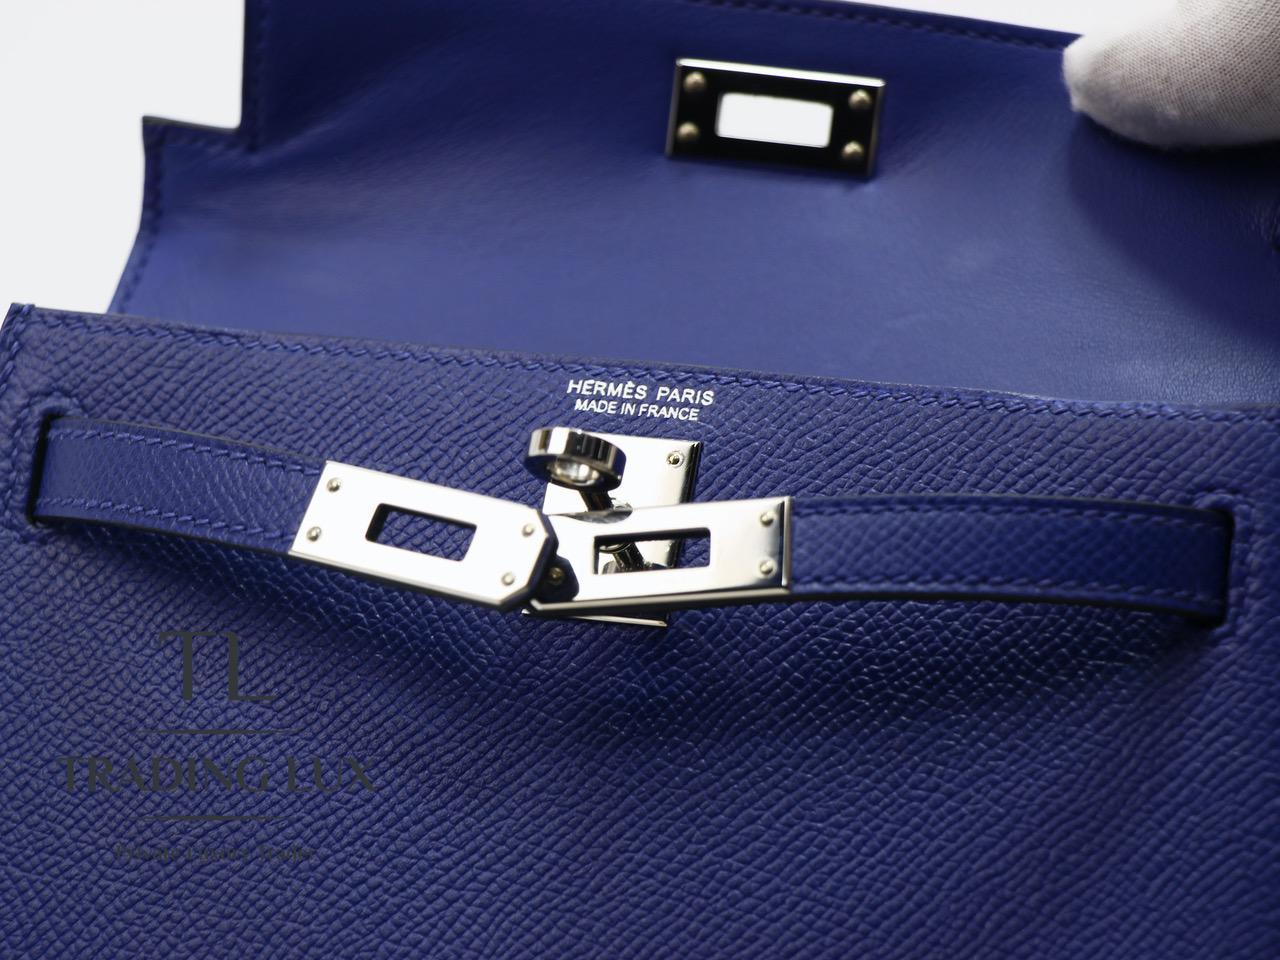 ermès-Mini-Kelly-20-Blue-Electric-12